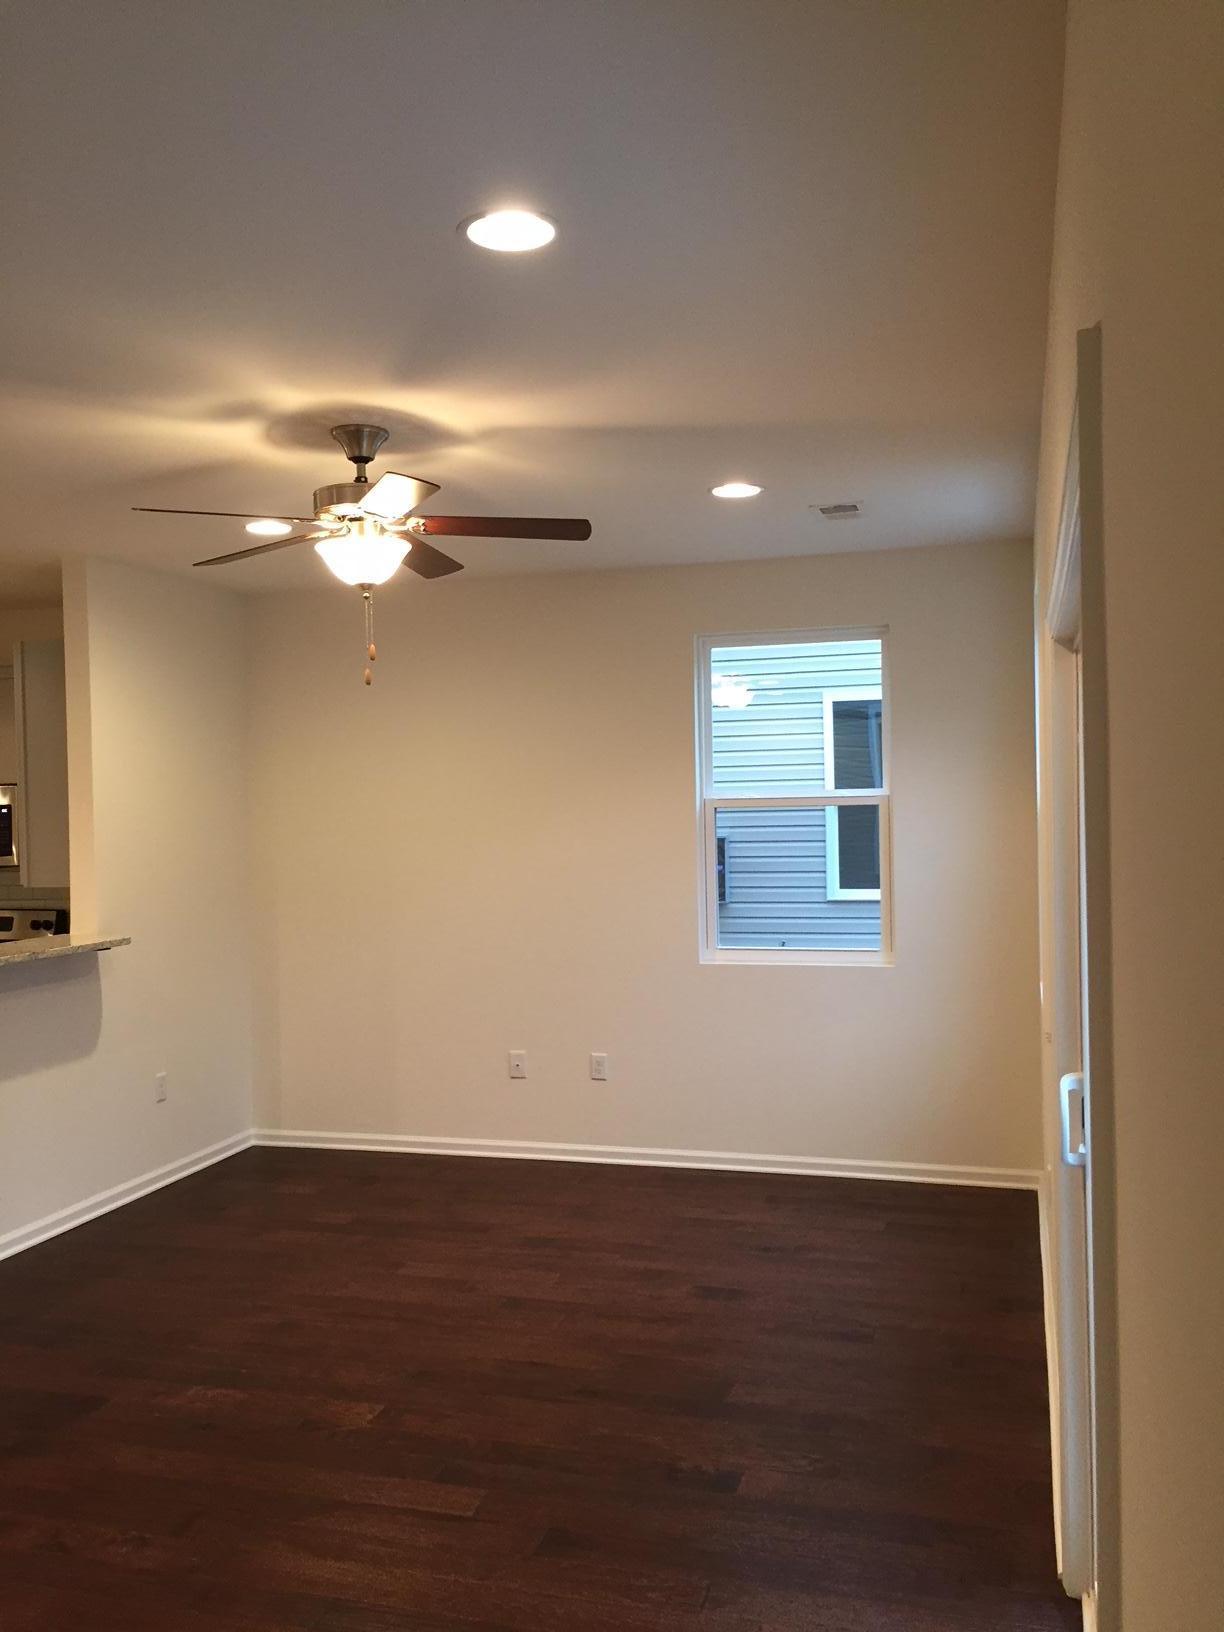 Riverland Place Homes For Sale - 274 Stefan, Charleston, SC - 29